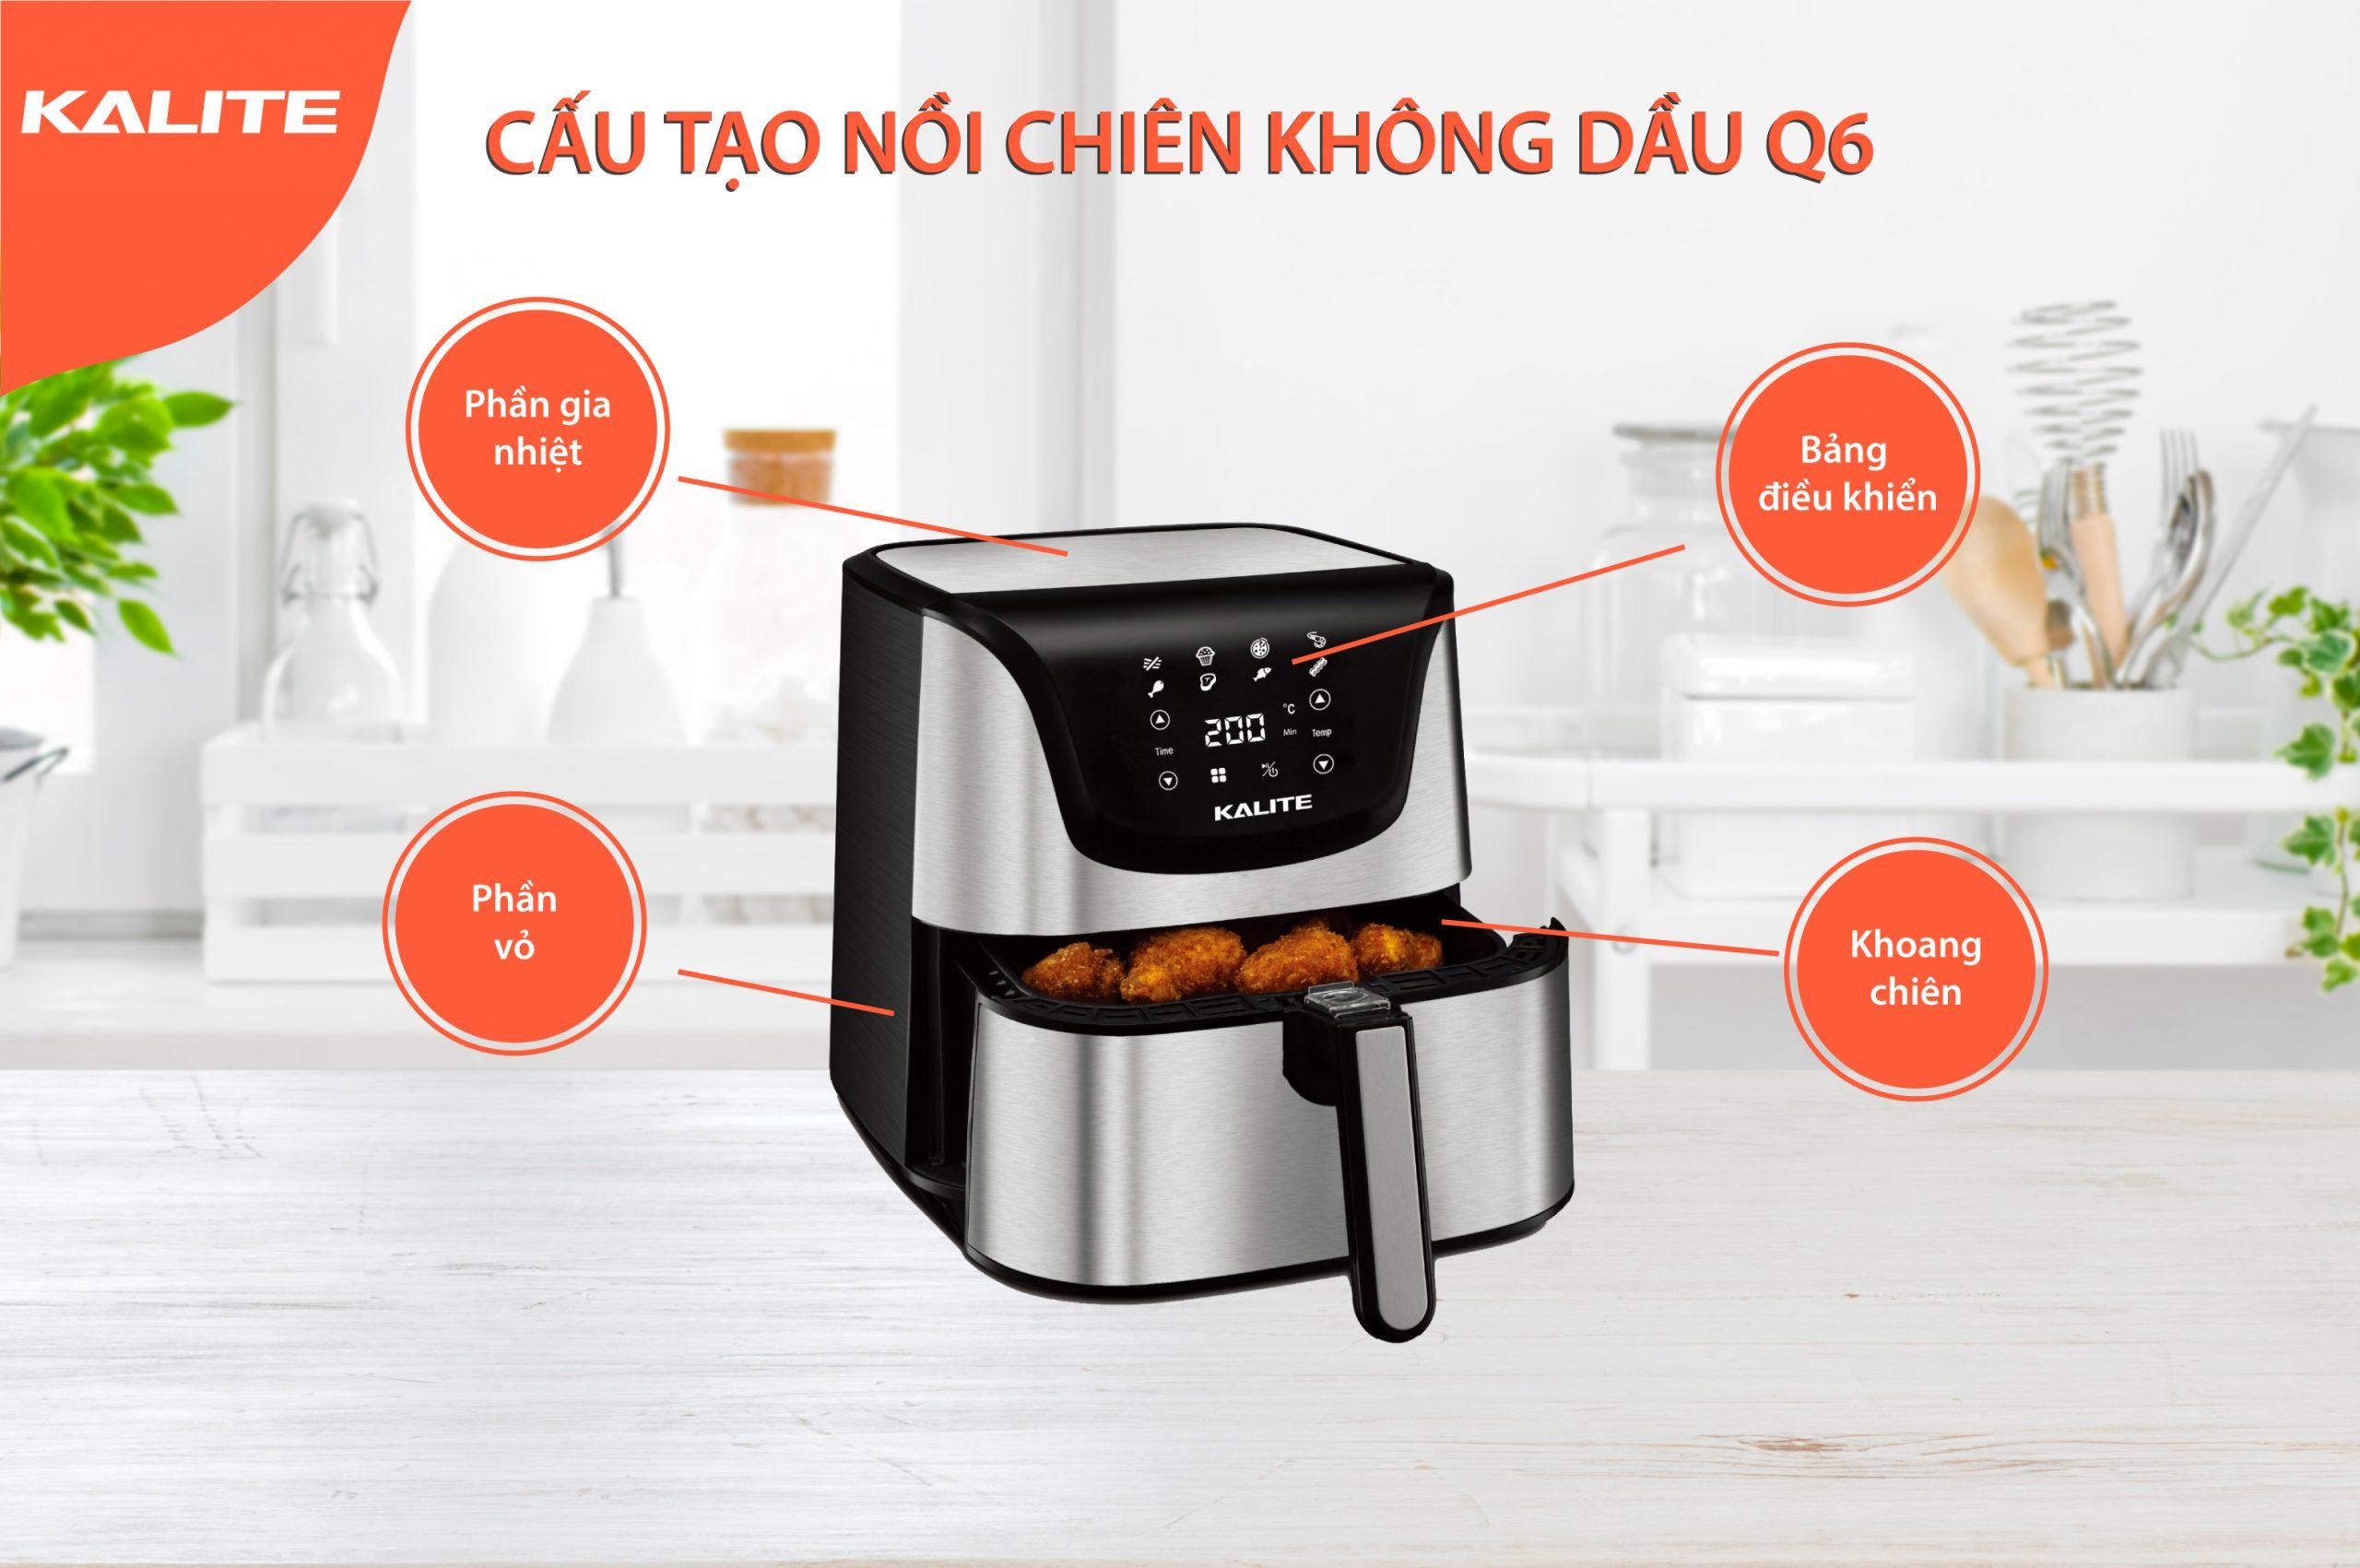 noi-chien-khong-dau-da-chuc-nang-kalite-q68